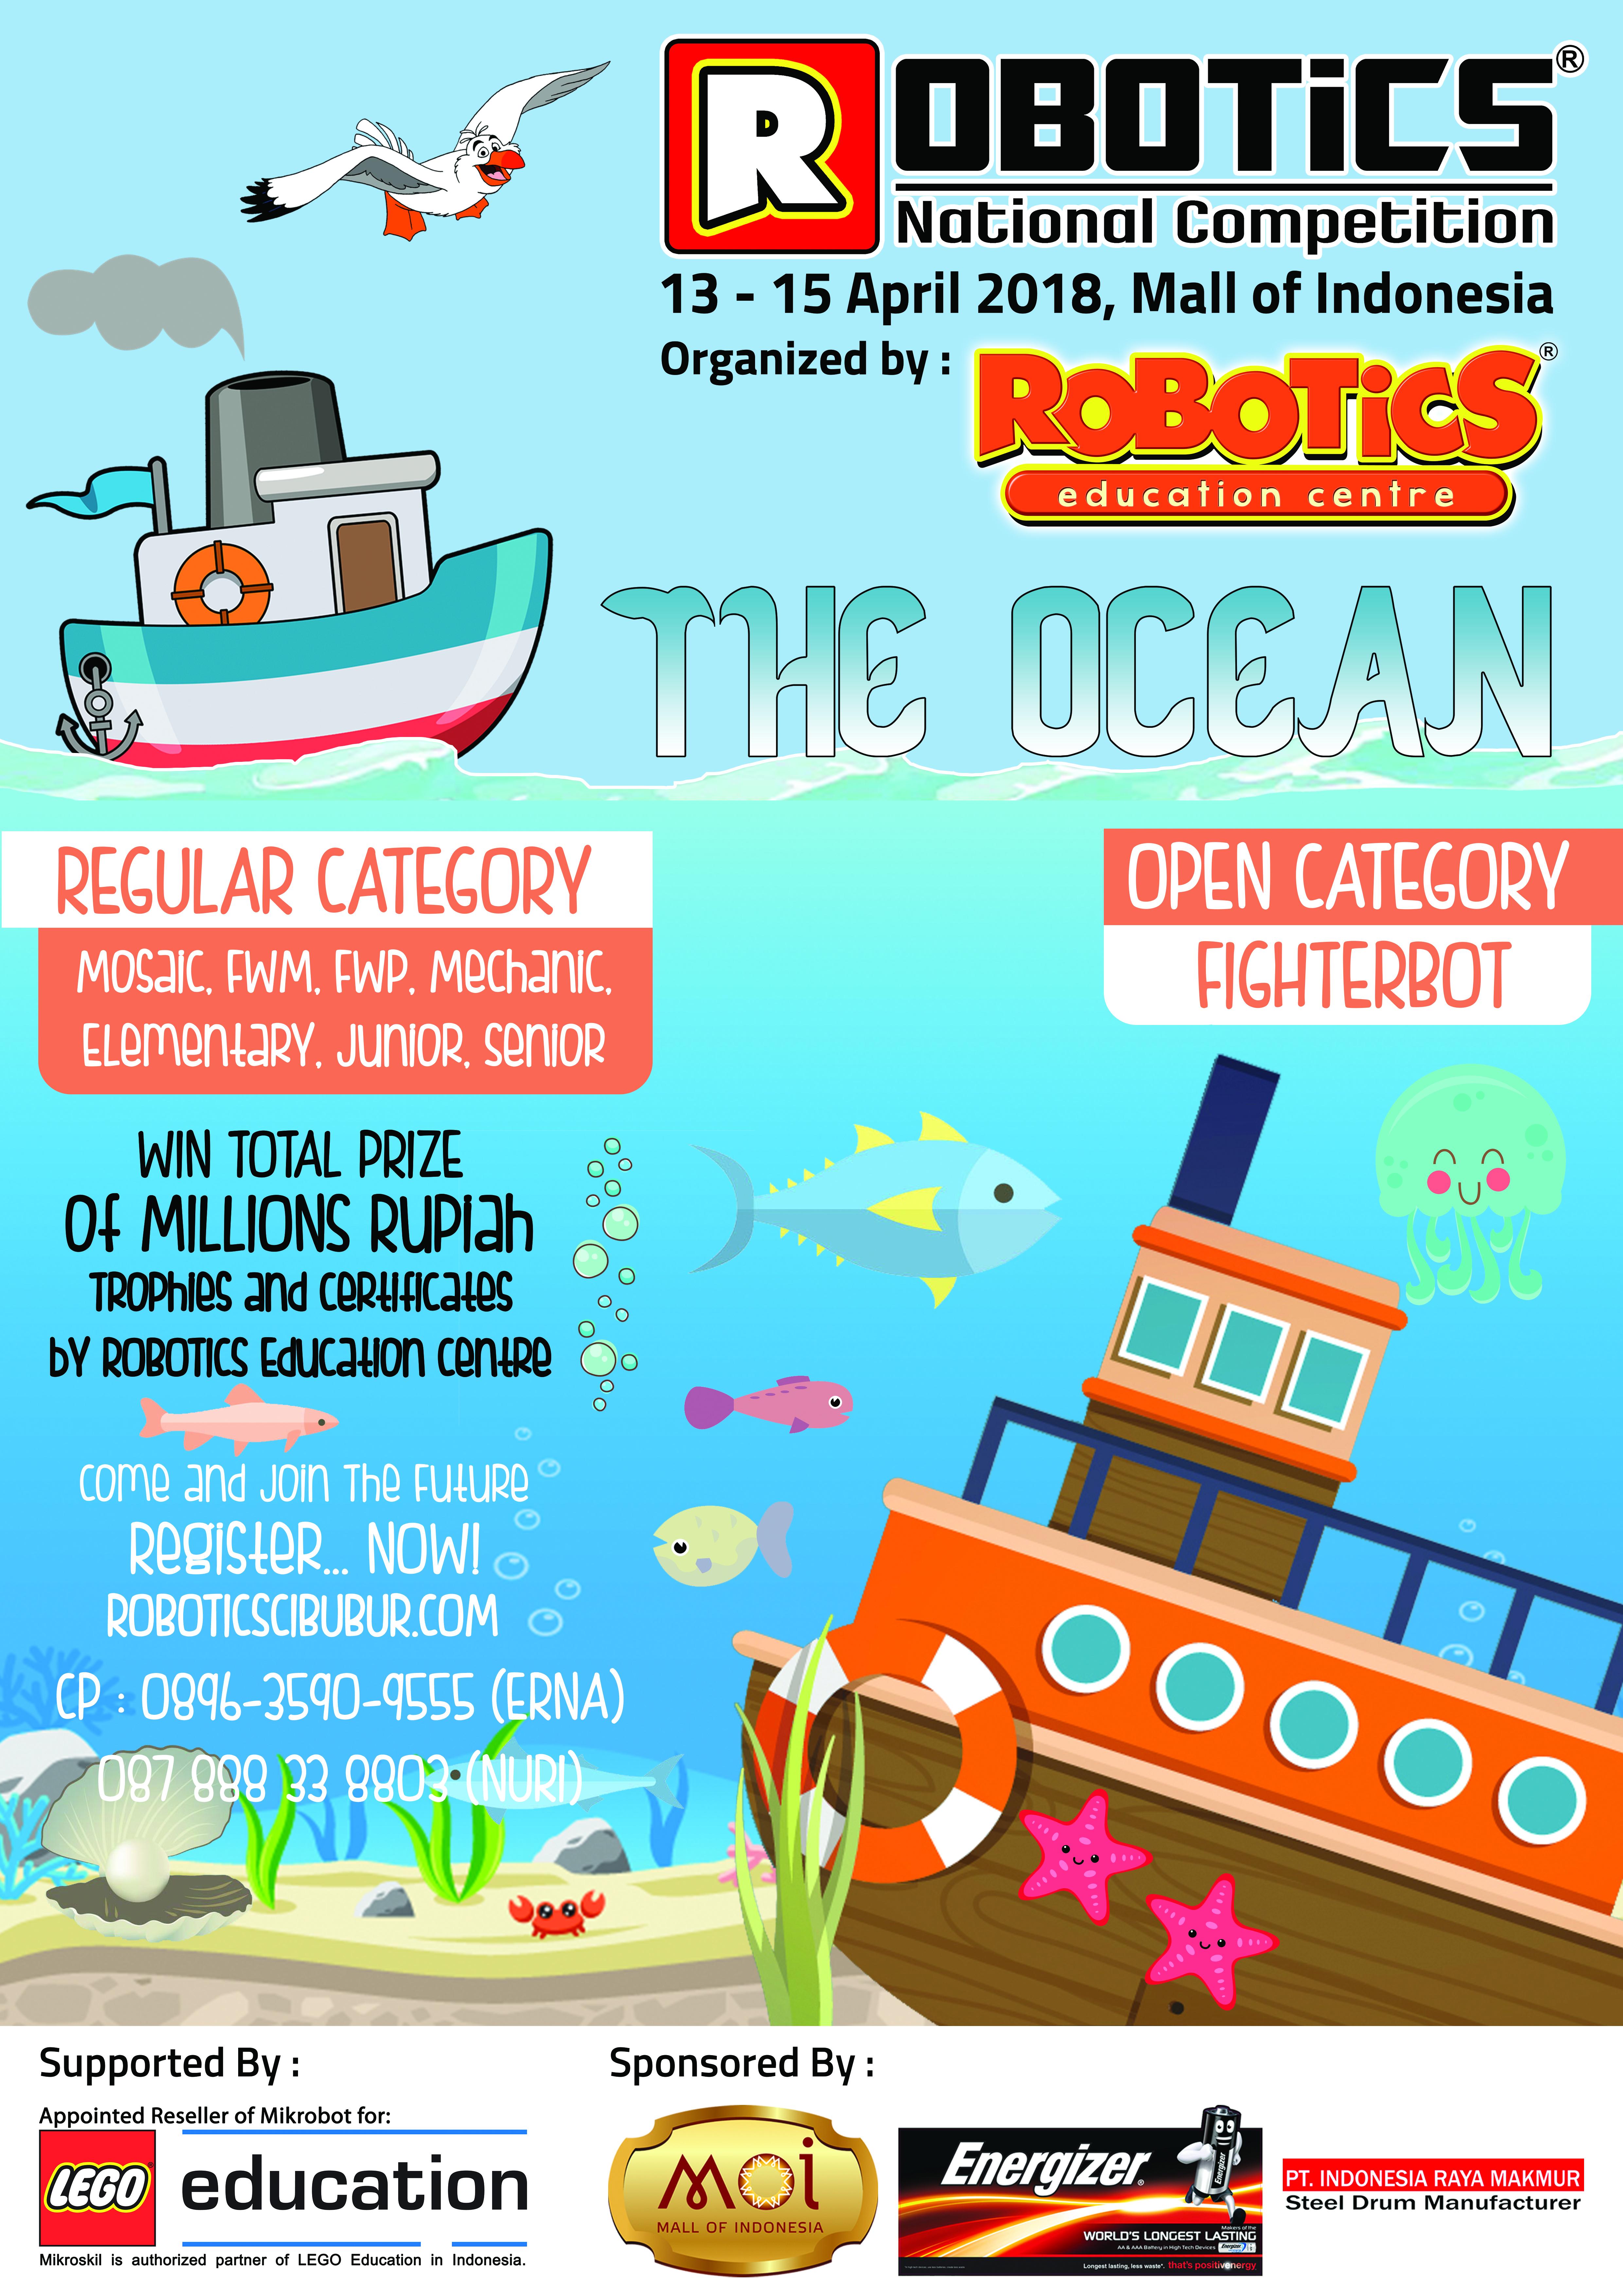 Robotics Education Center Cibubur News